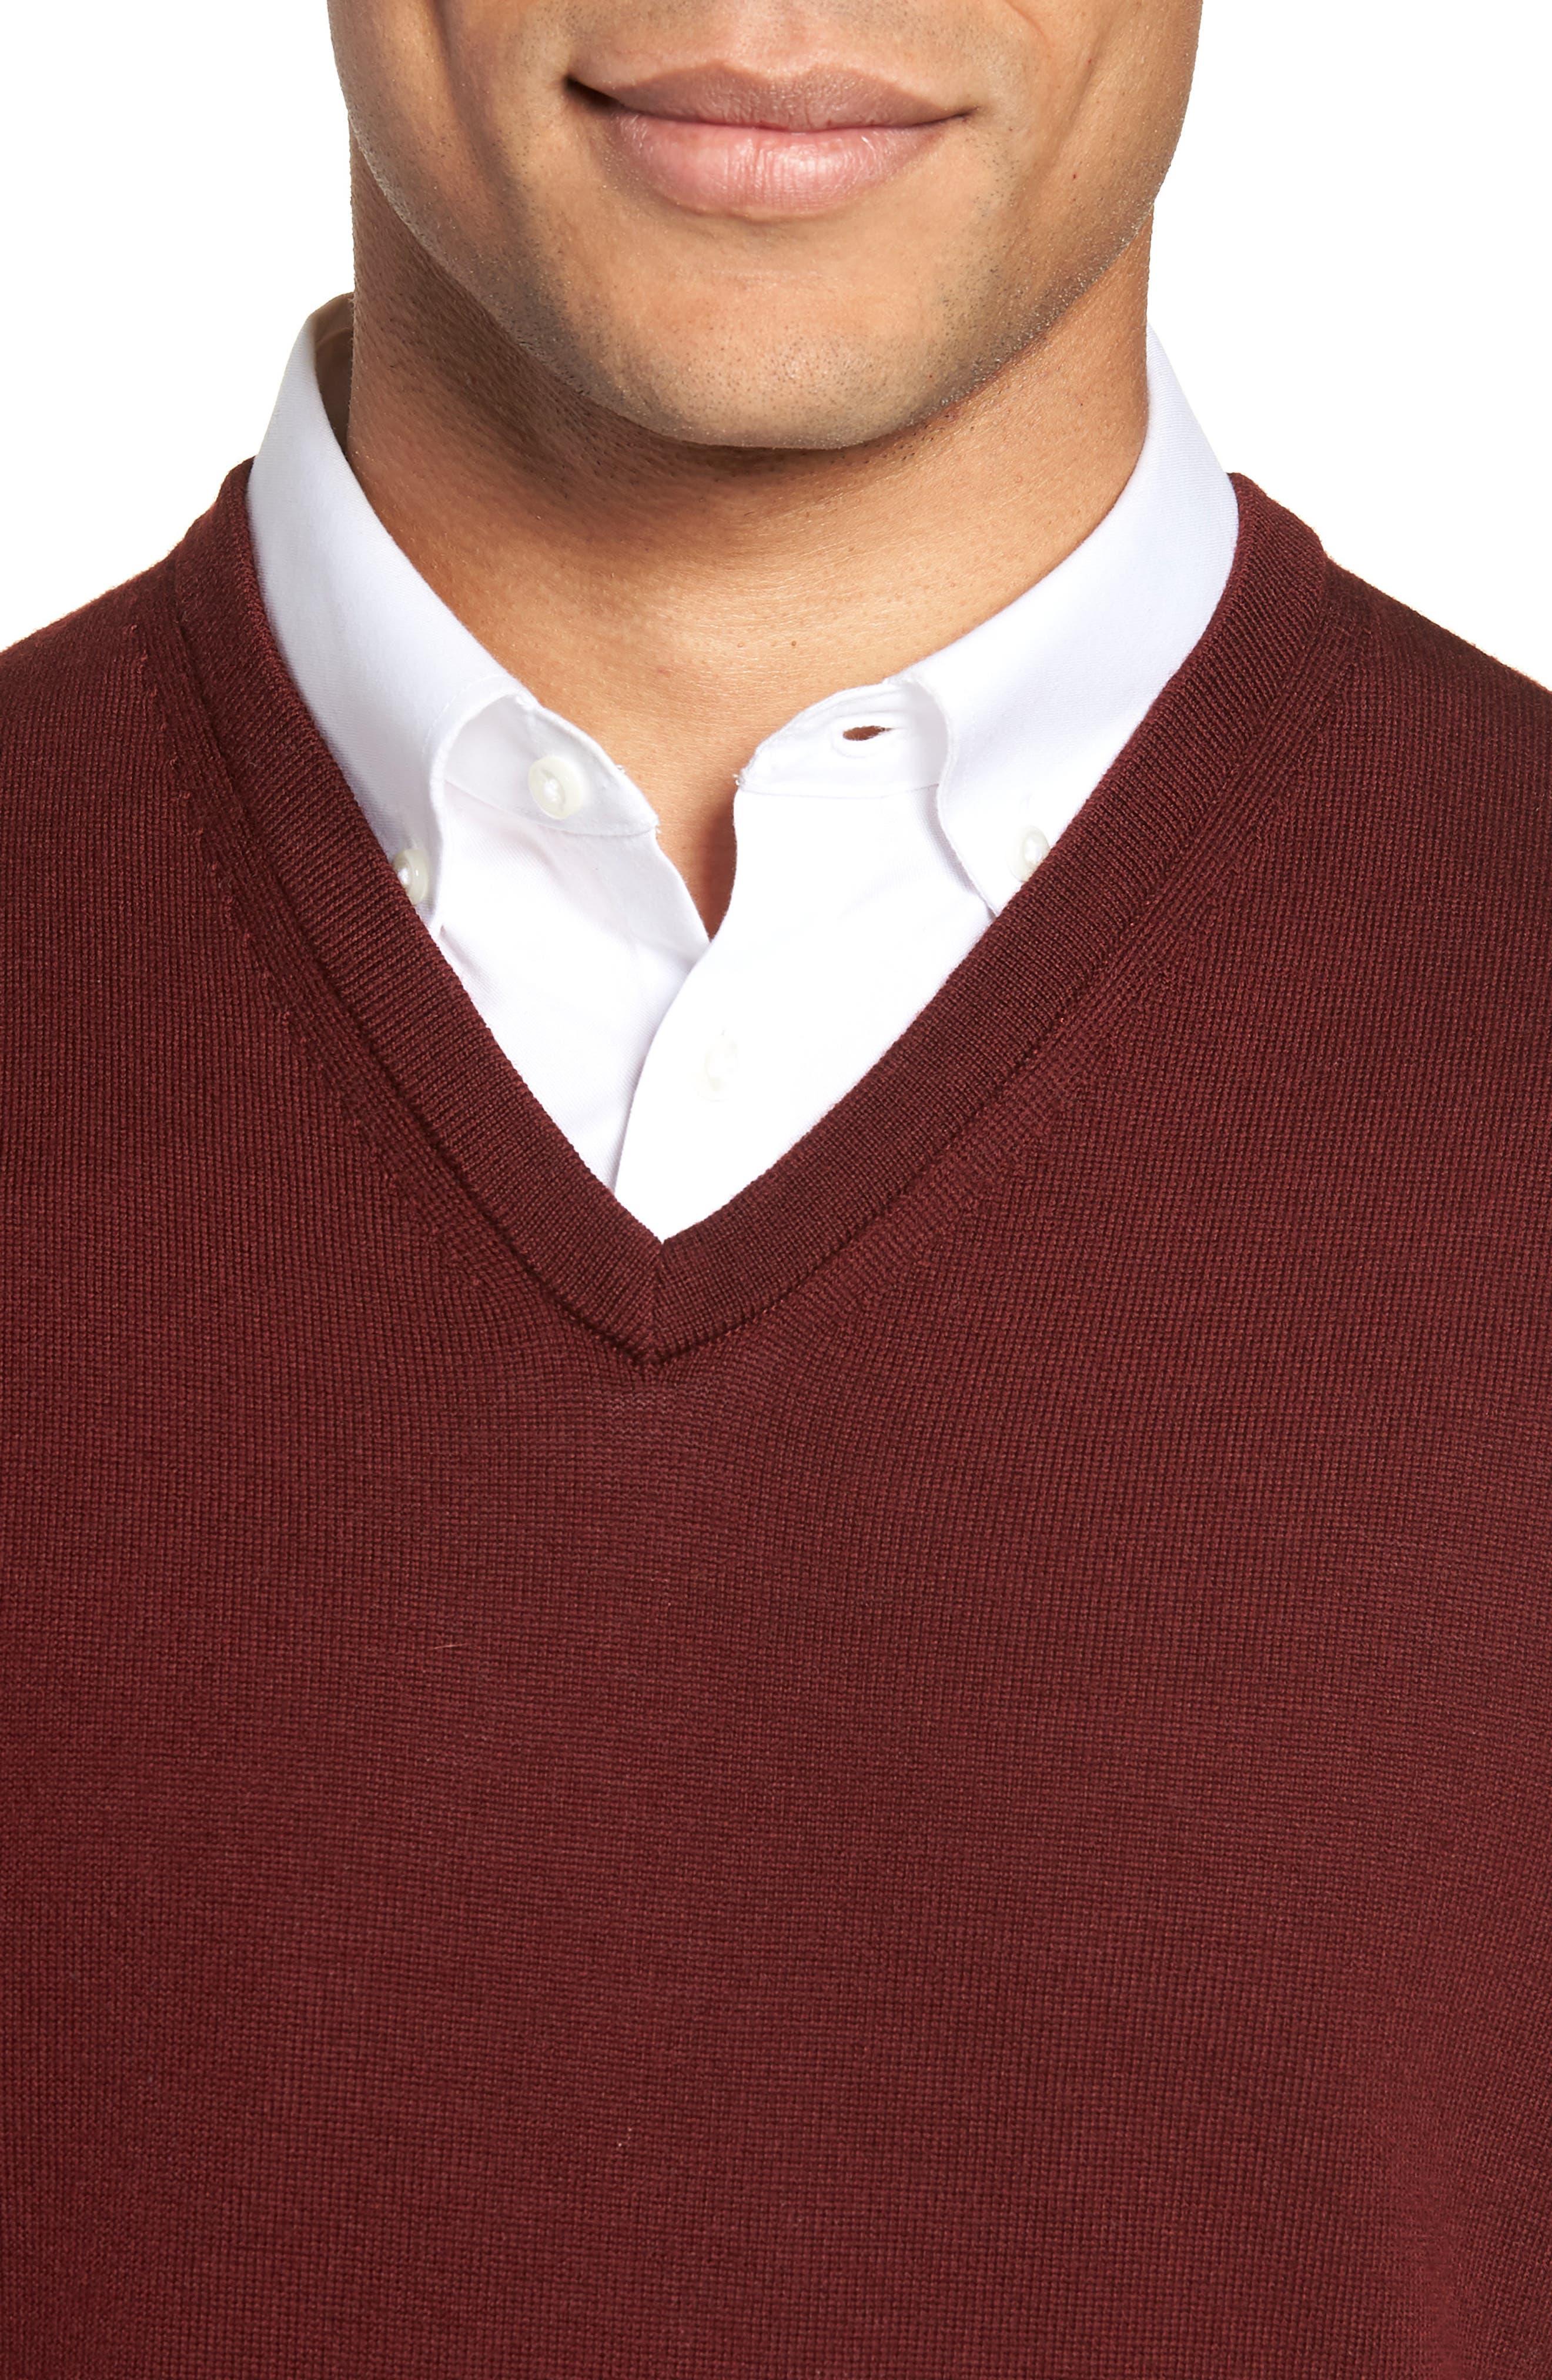 Merino Wool Sweater Vest,                             Alternate thumbnail 4, color,                             BURGUNDY ROYALE